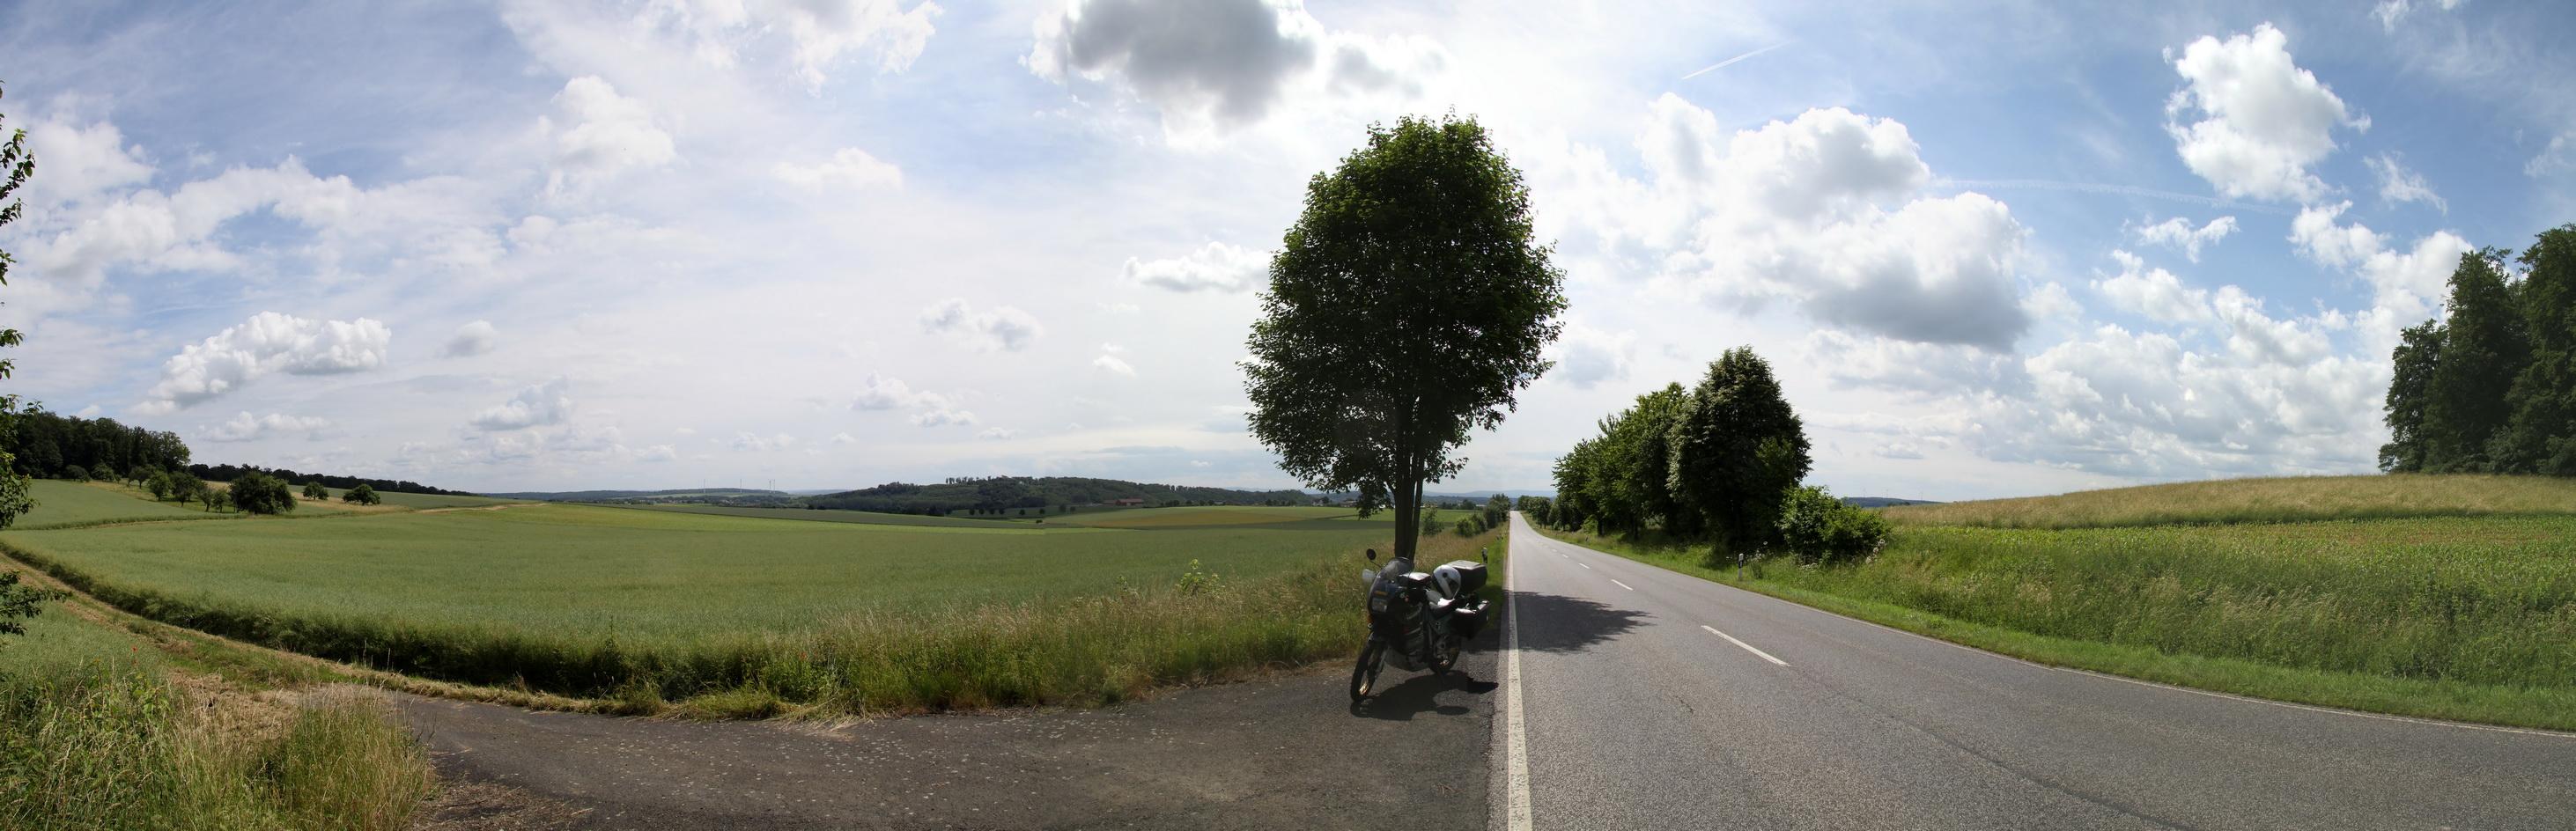 2012-06 Irgendwo in Bayern